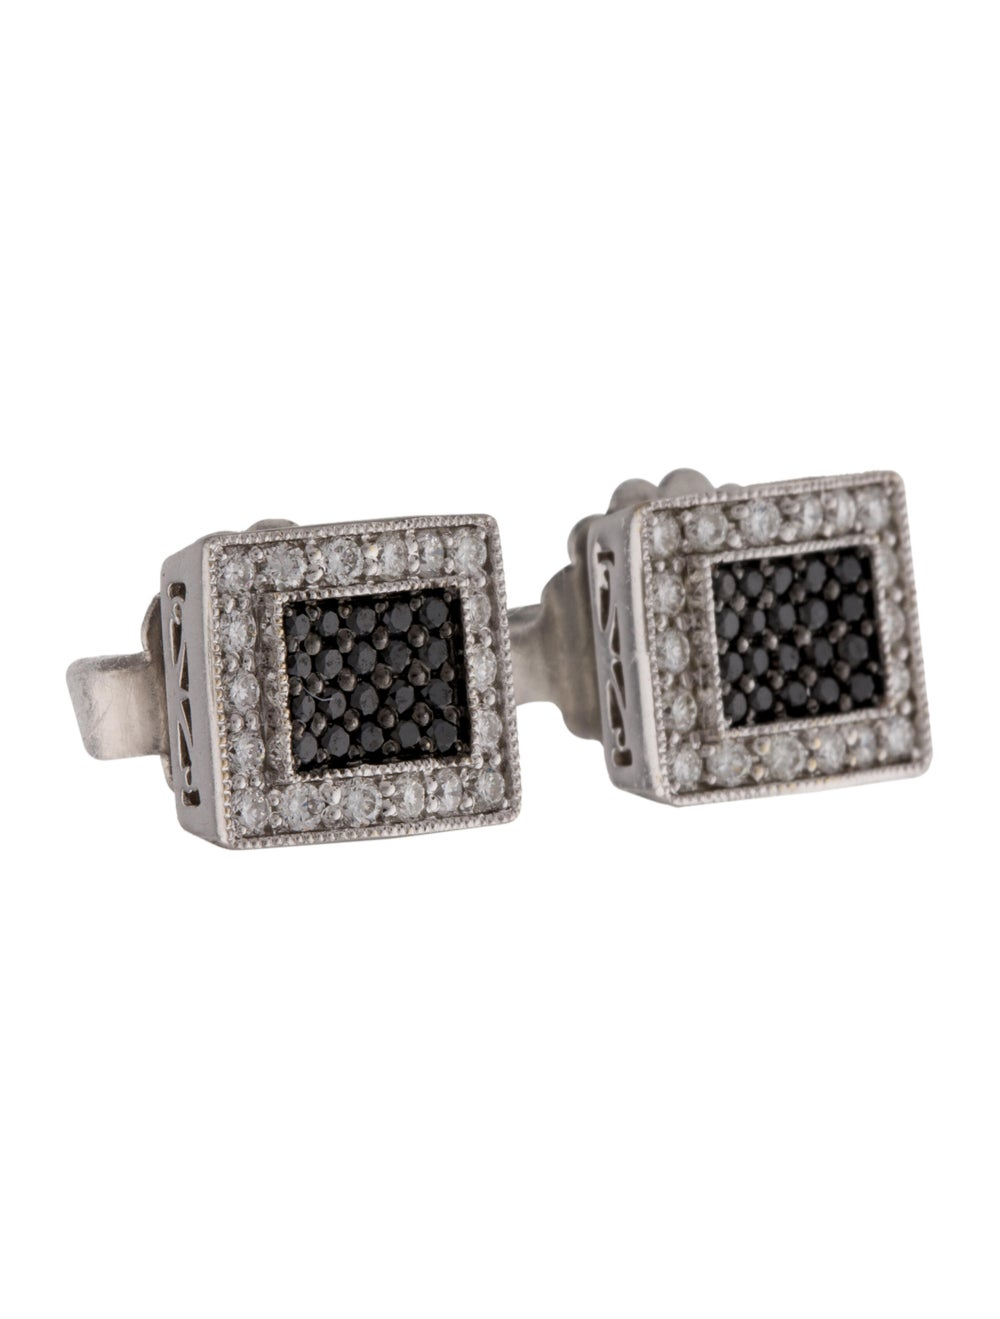 Earrings 18K Diamond Stud Earrings White - image 3